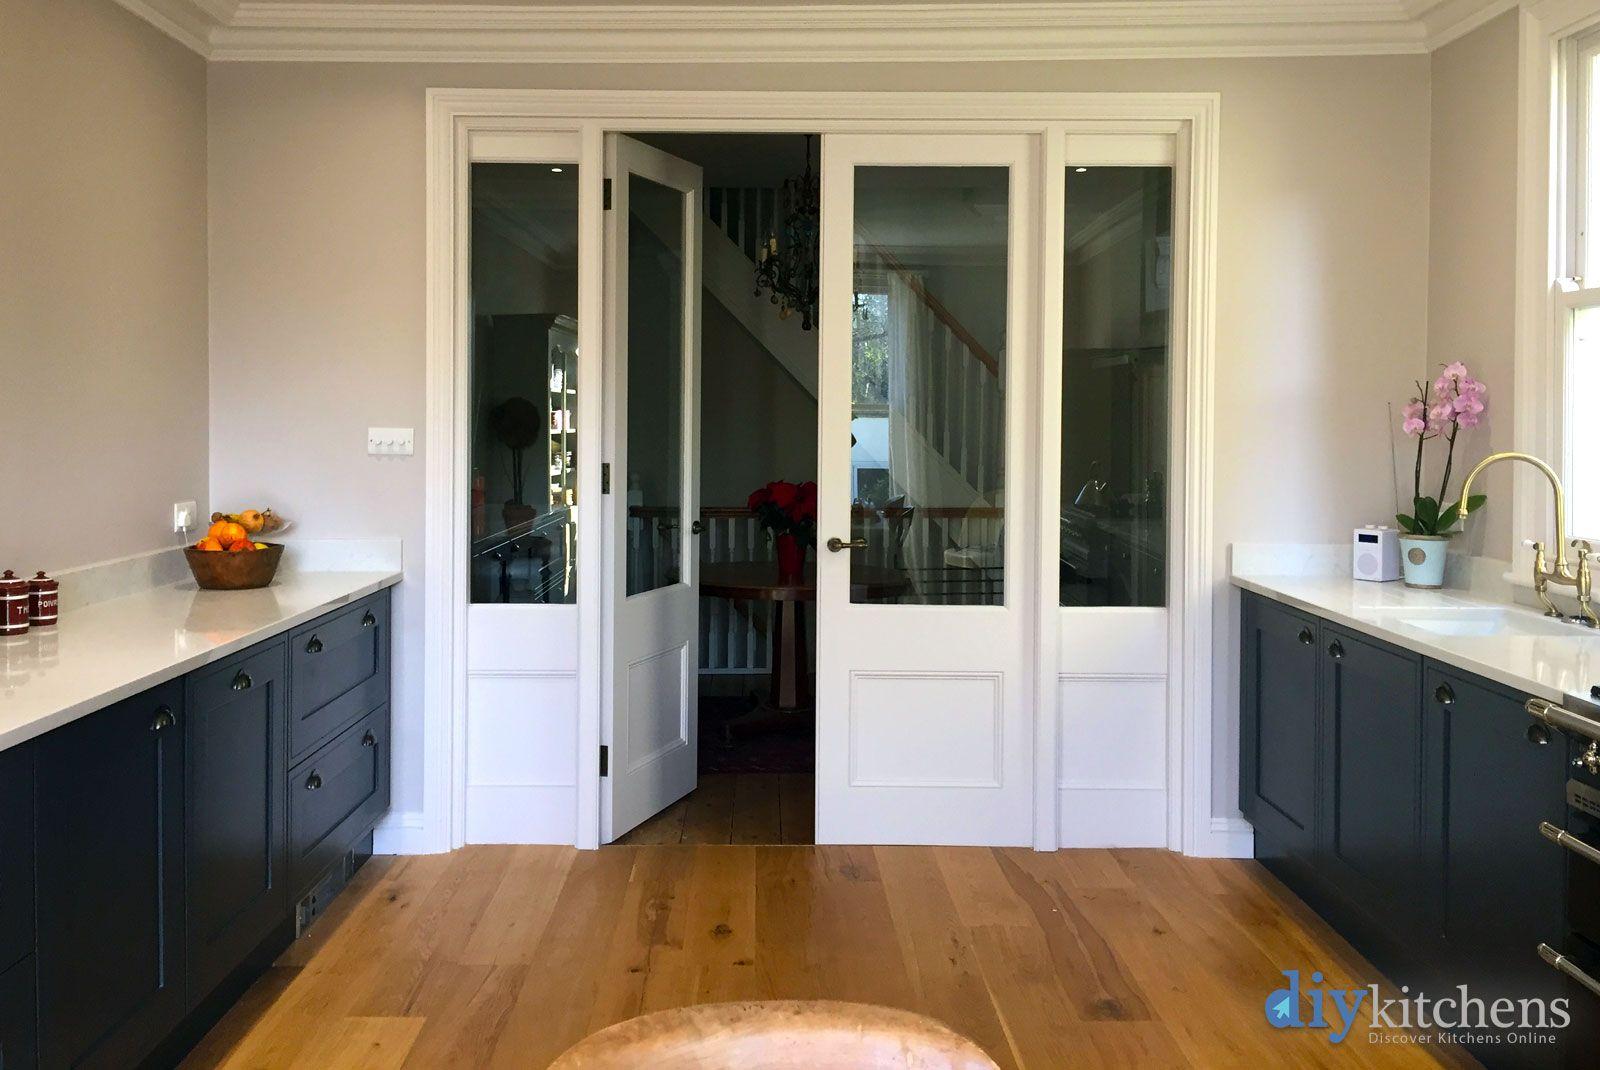 An Innova Welton Bespoke Painted Inframe Effect Kitchen